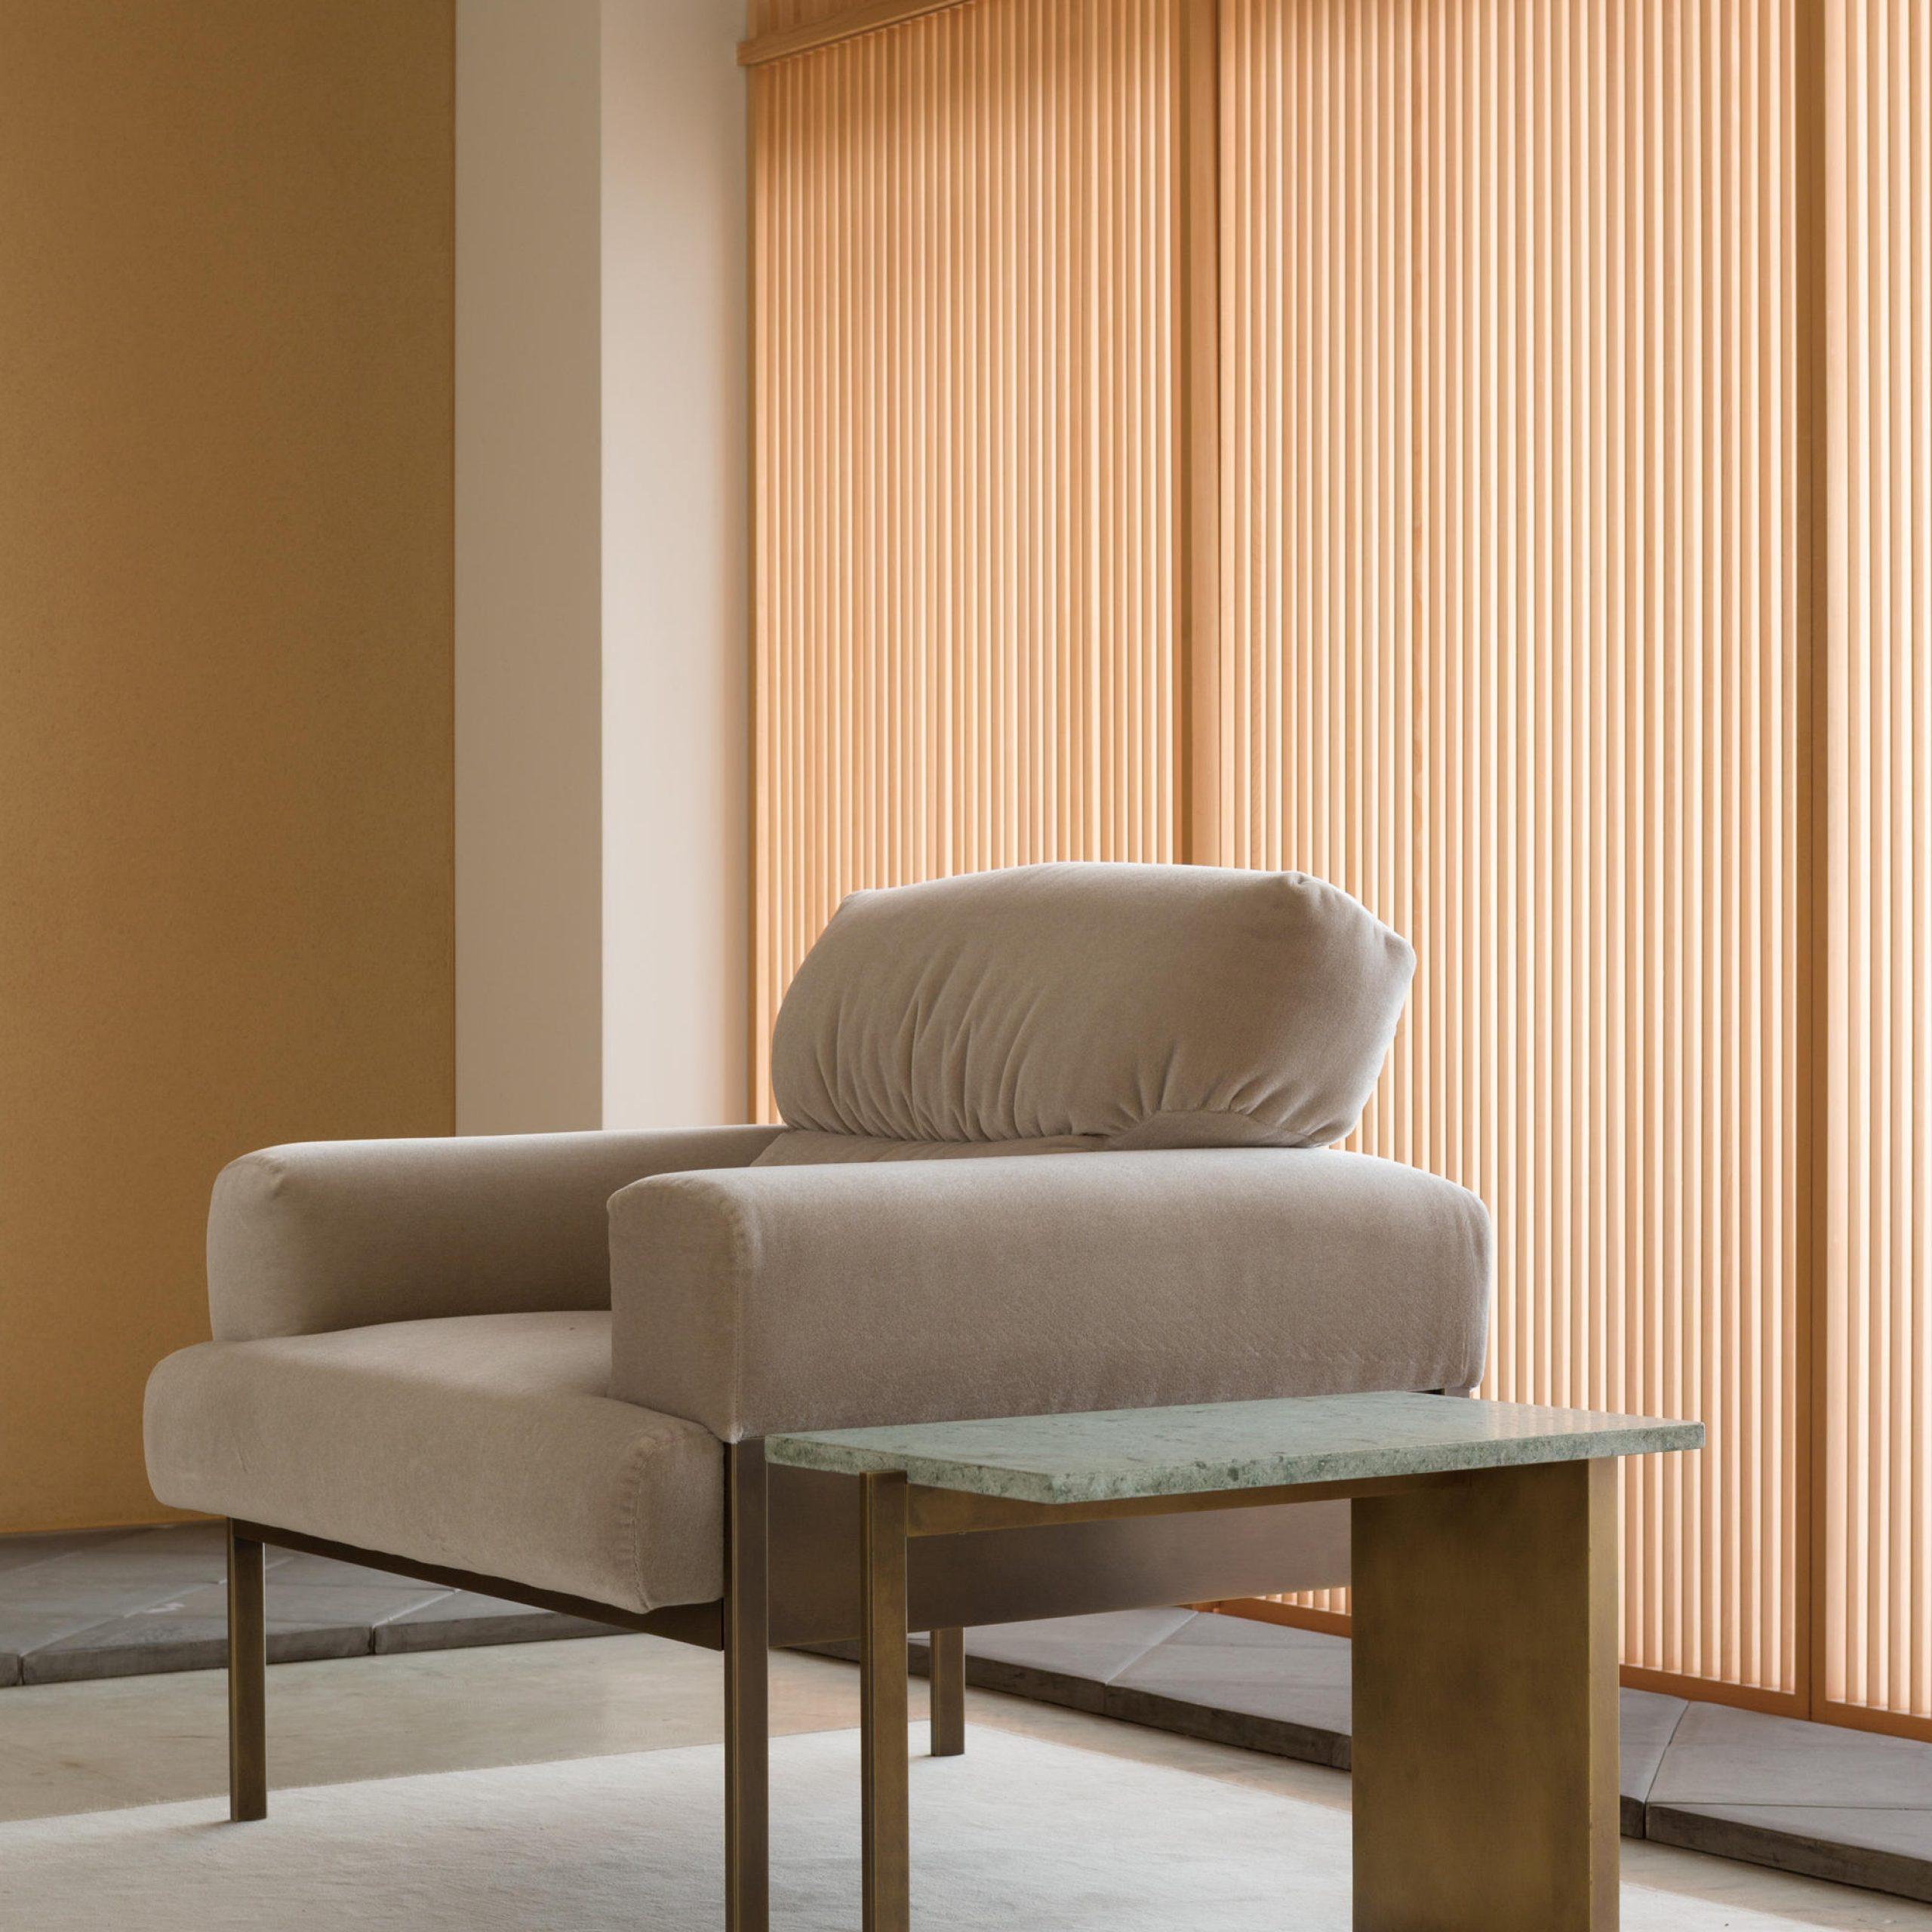 Suki | Armchair & Designer Furniture | Architonic In Suki Armchairs (View 4 of 15)